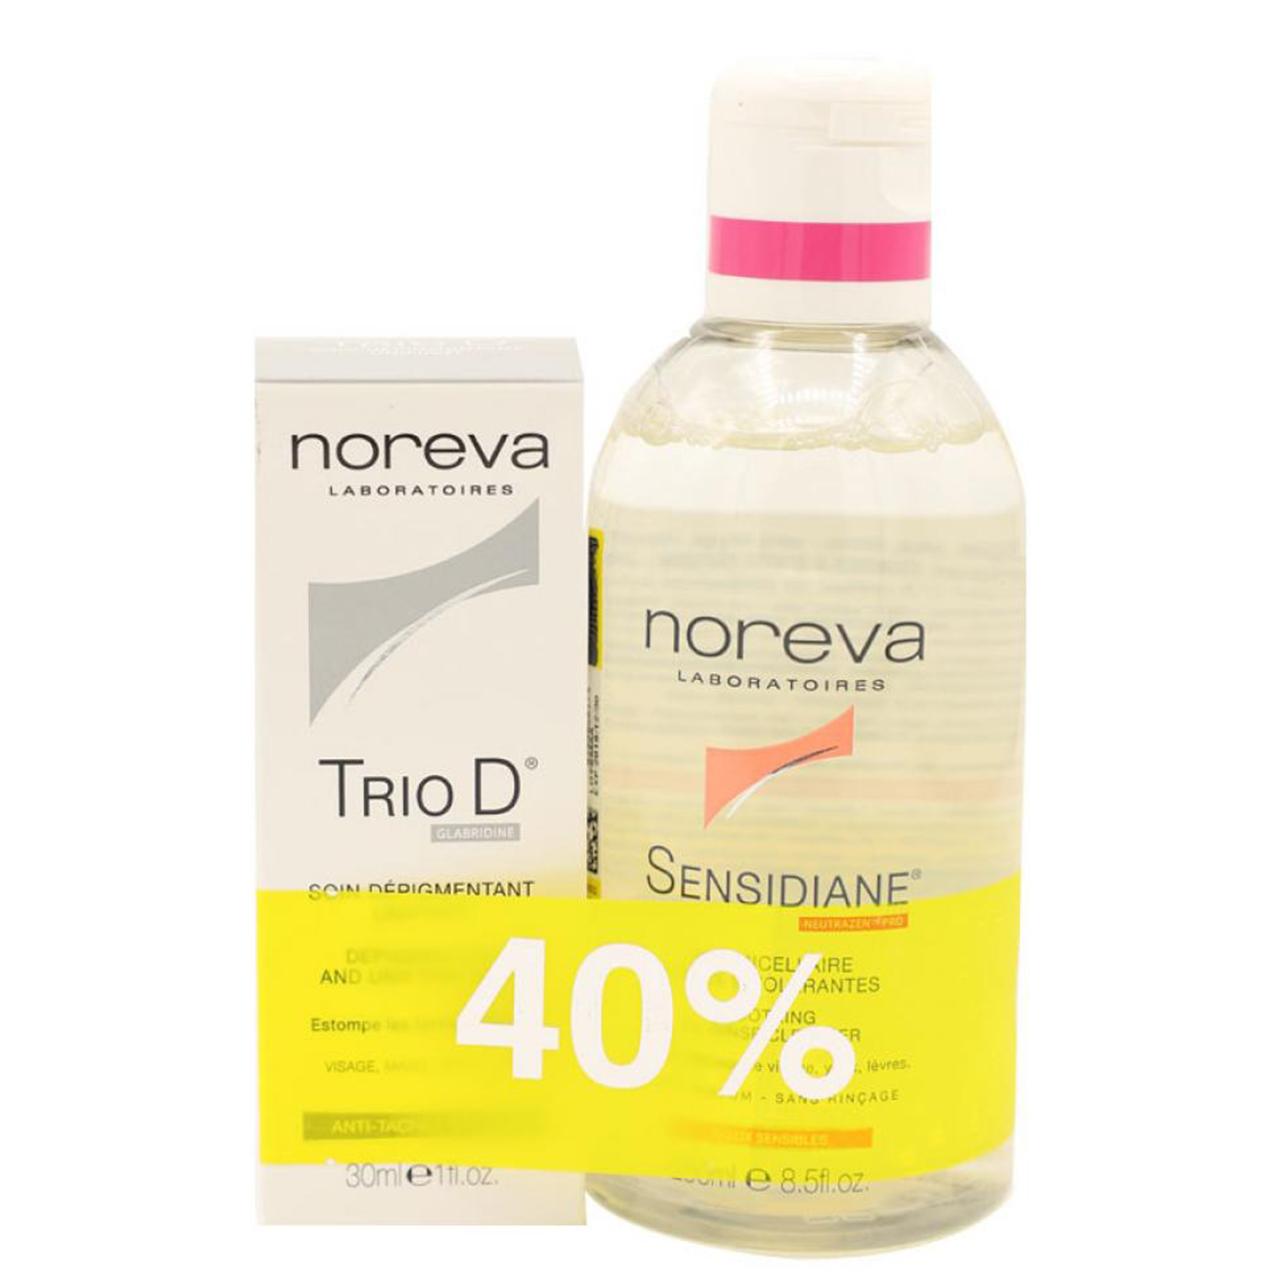 محلول پاک کننده صورت سن سی دیان نوروا به همراه ضد لک تریو دی نوروا